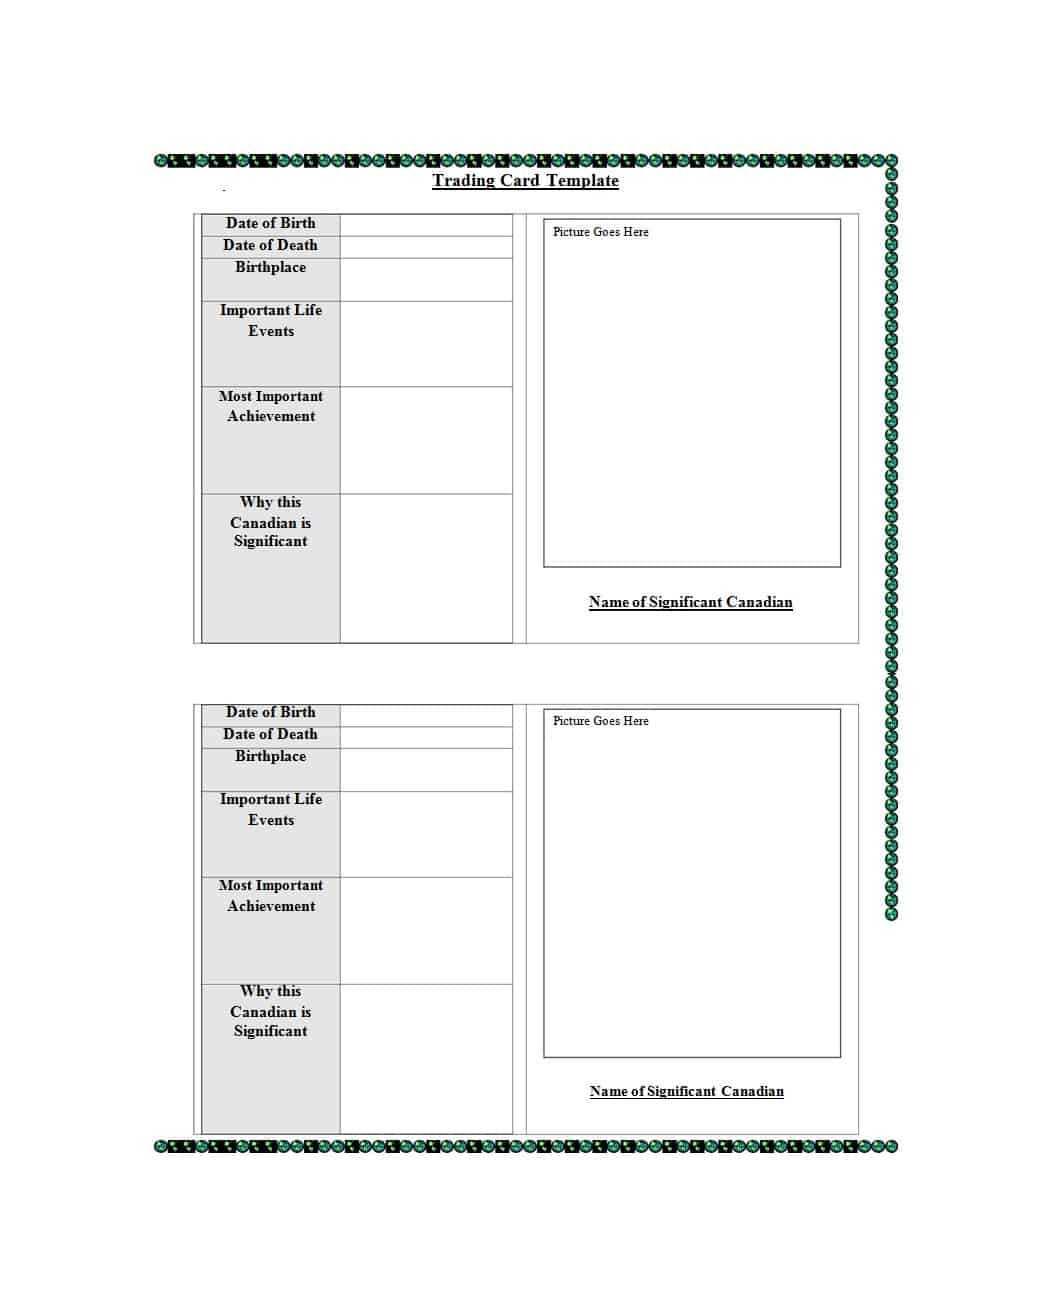 018 Printable Baseball Card Template Ideas Trading Wondrous Within Baseball Card Size Template